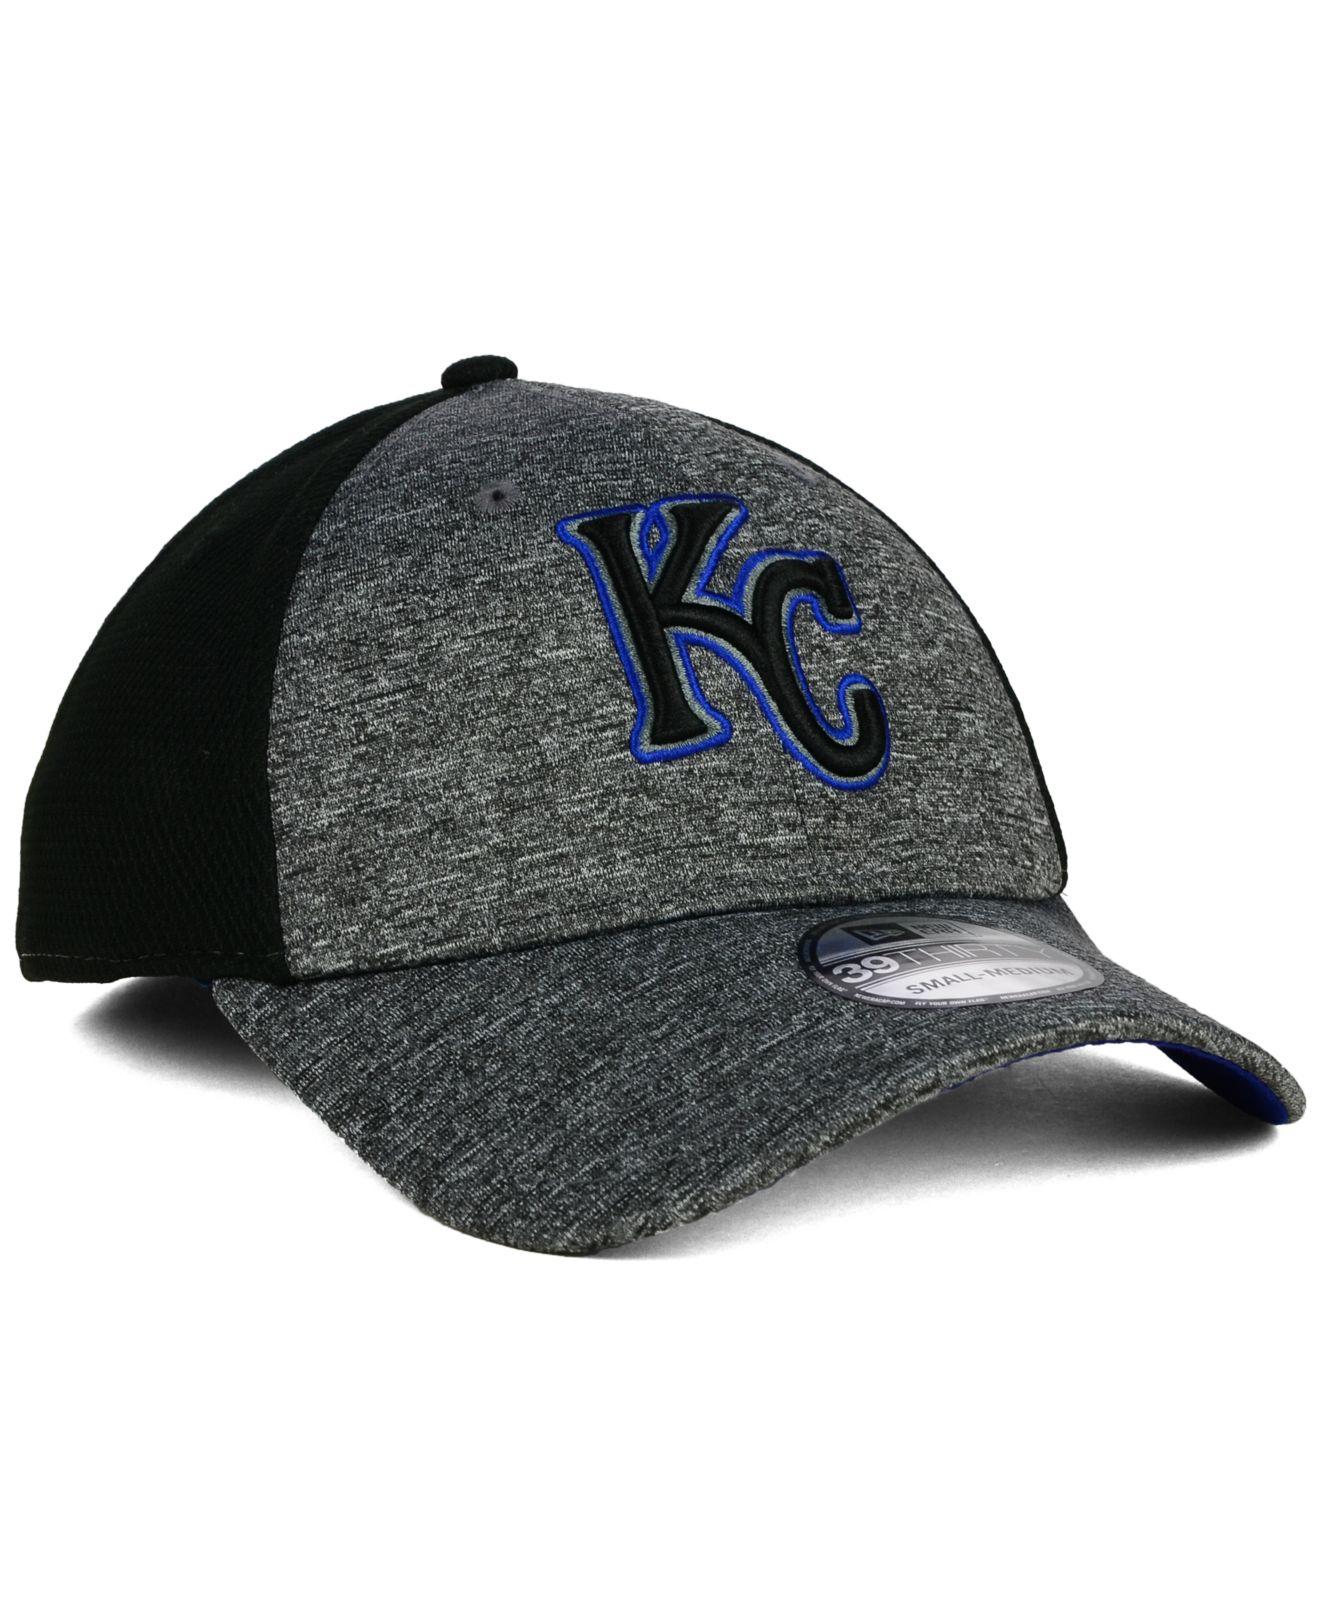 hot sale online 3f111 0c558 sweden lyst ktz kansas city royals tech fuse 39thirty cap in gray for men  f4a51 84107